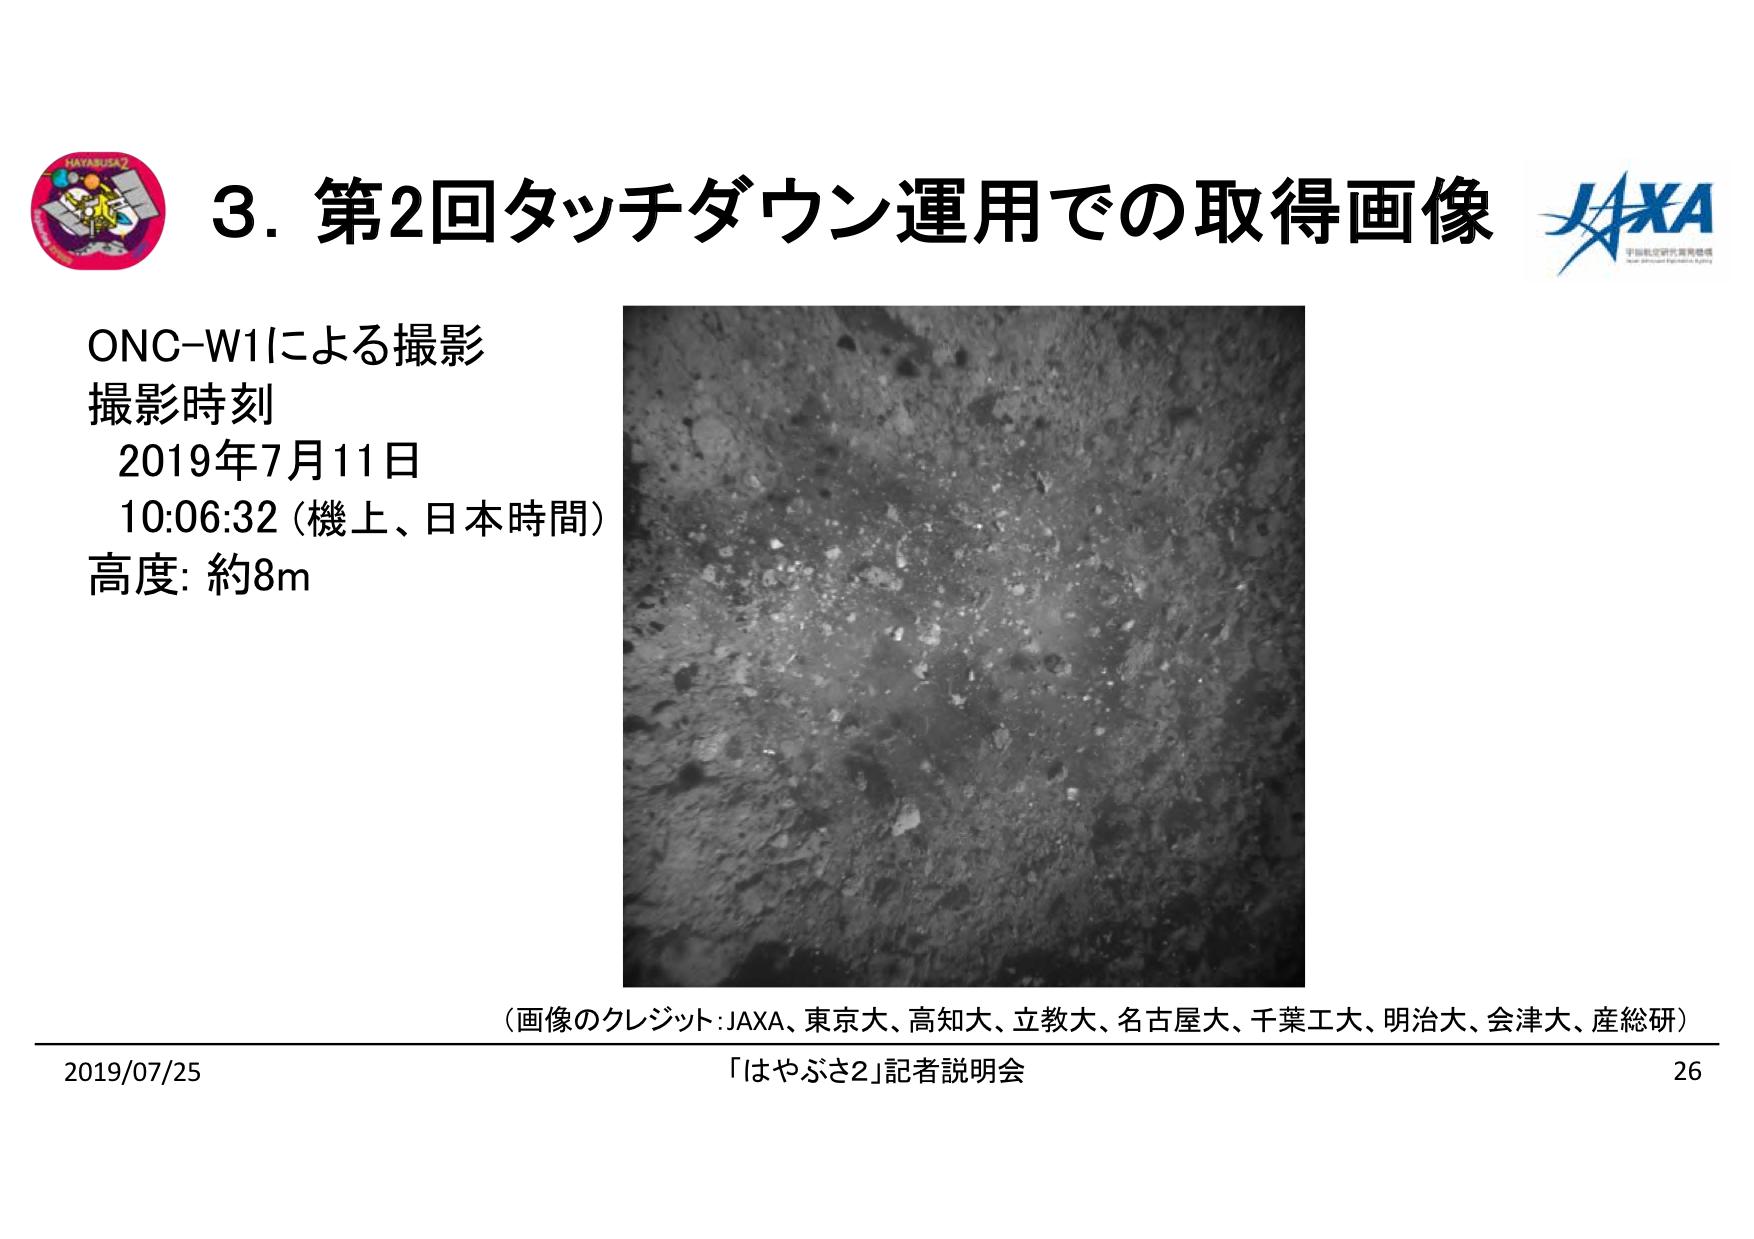 f:id:Imamura:20190725151328p:plain